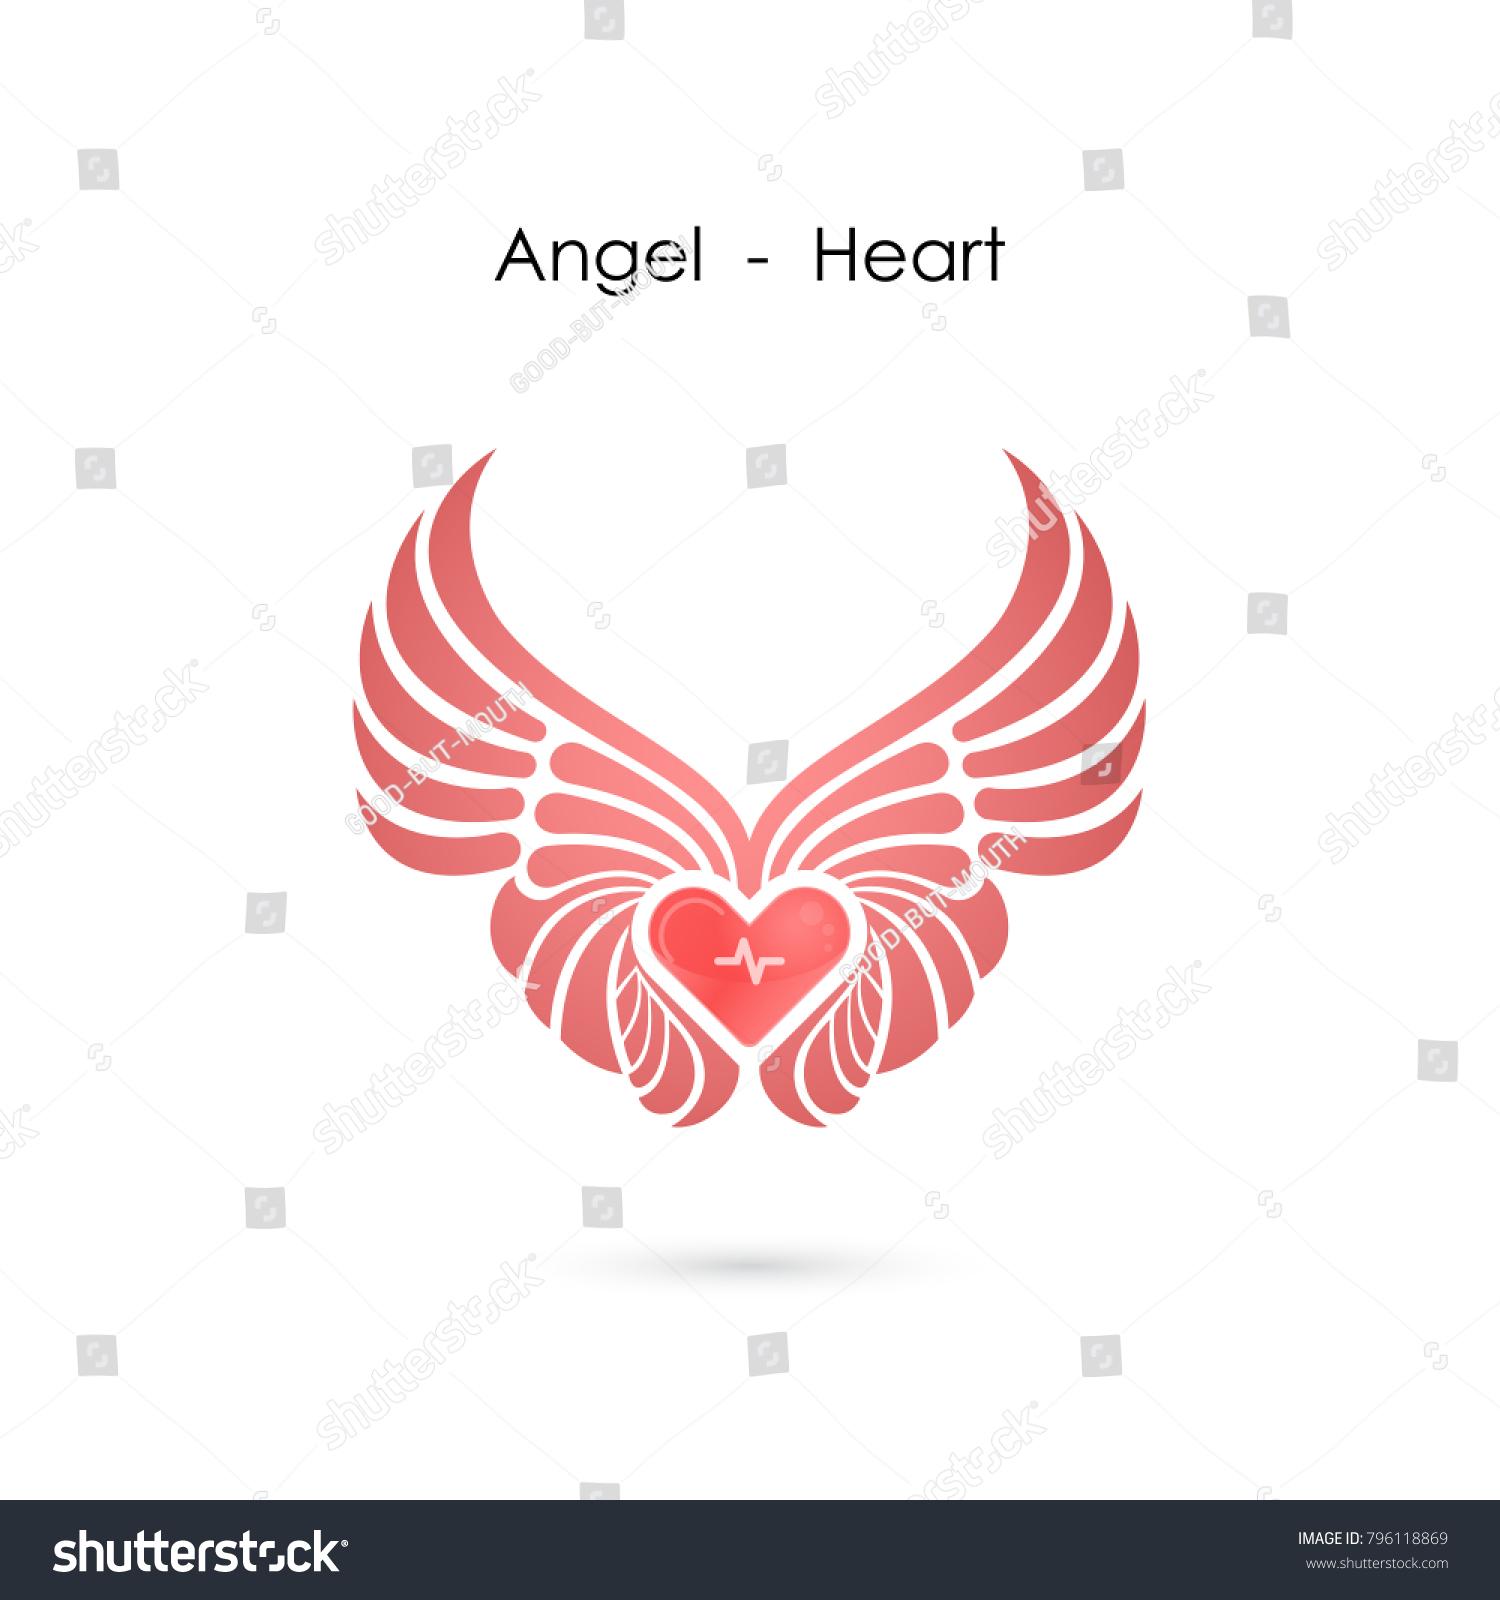 Heart Logo Angel Wings Logo Design Stock Vector Royalty Free